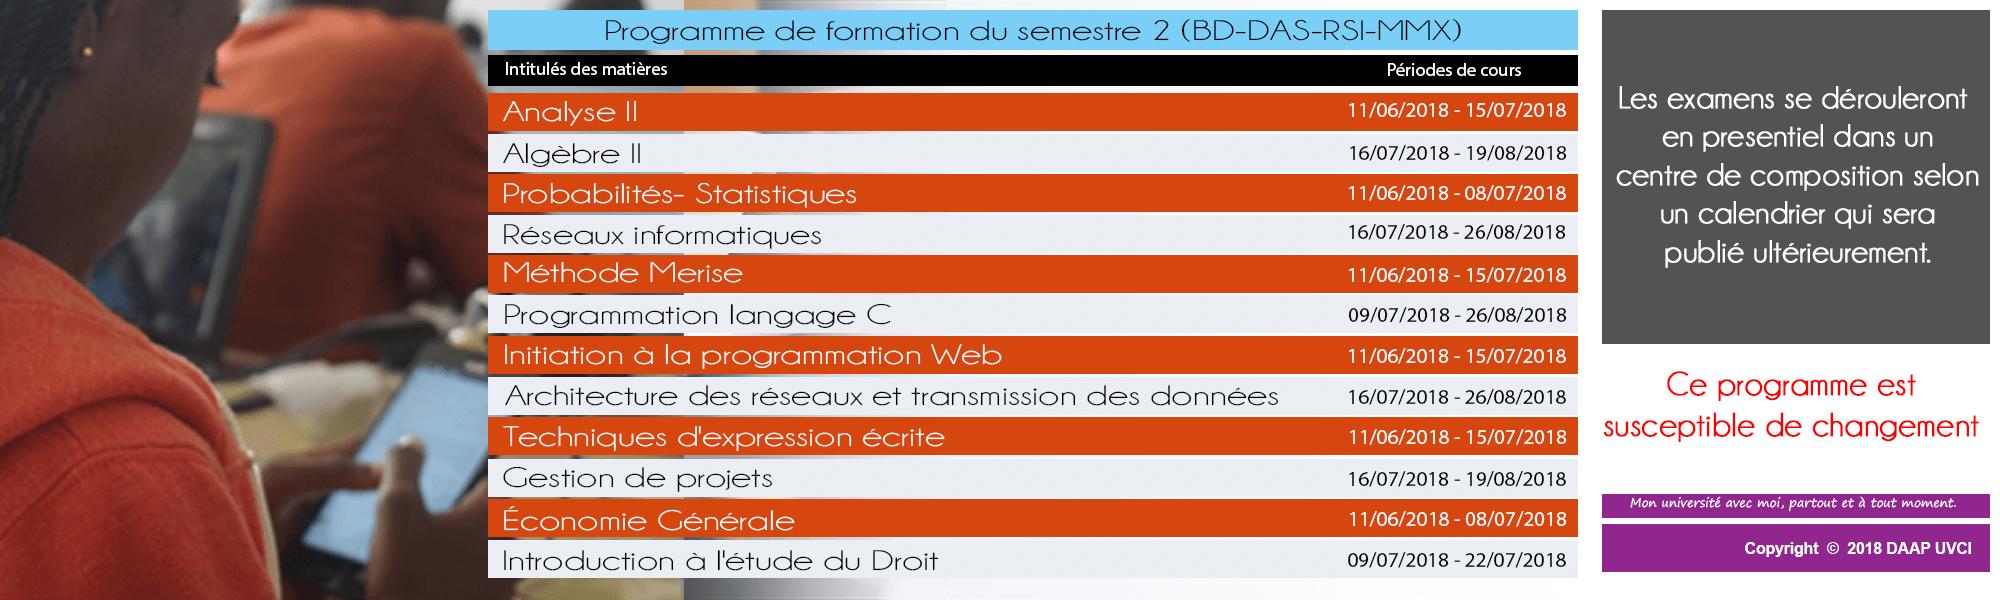 Programme Semestre 2 das-rsi-bd-mmx